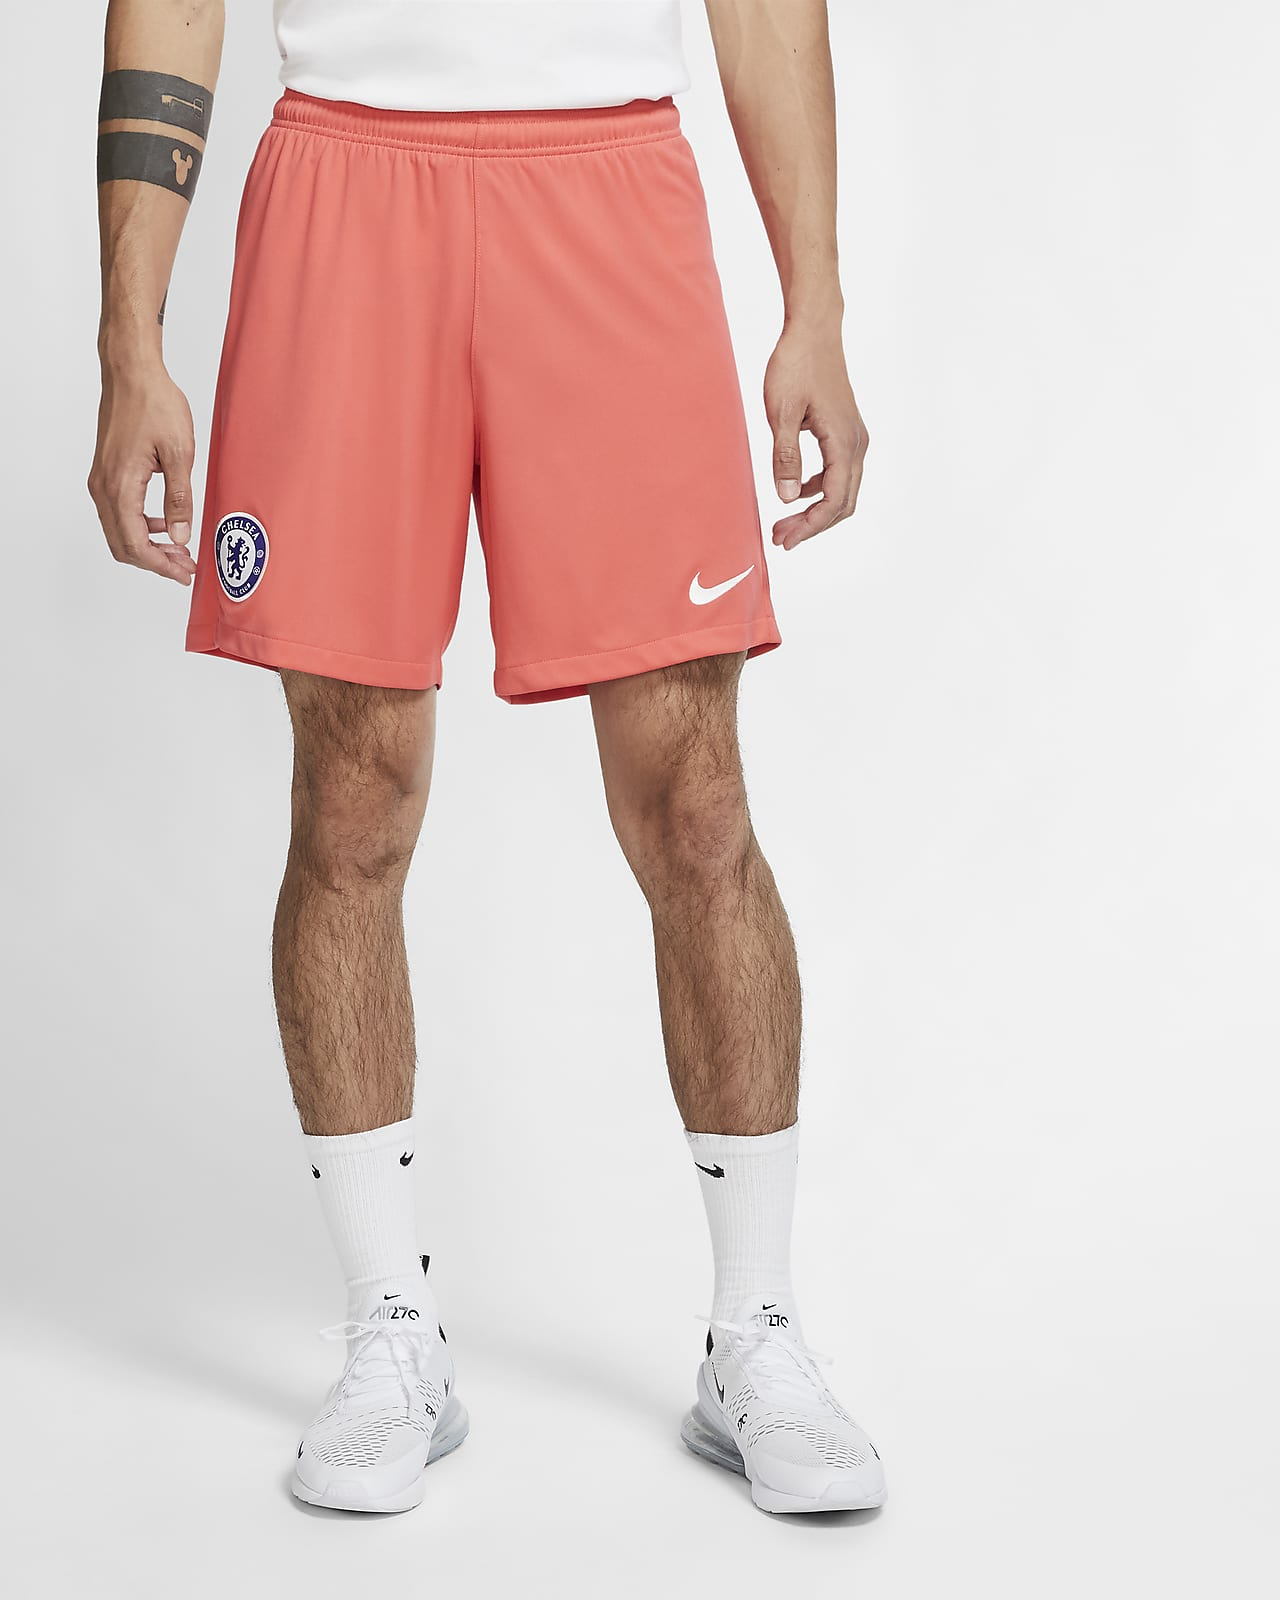 Chelsea F.C. 2020/21 Stadium Third Men's Football Shorts